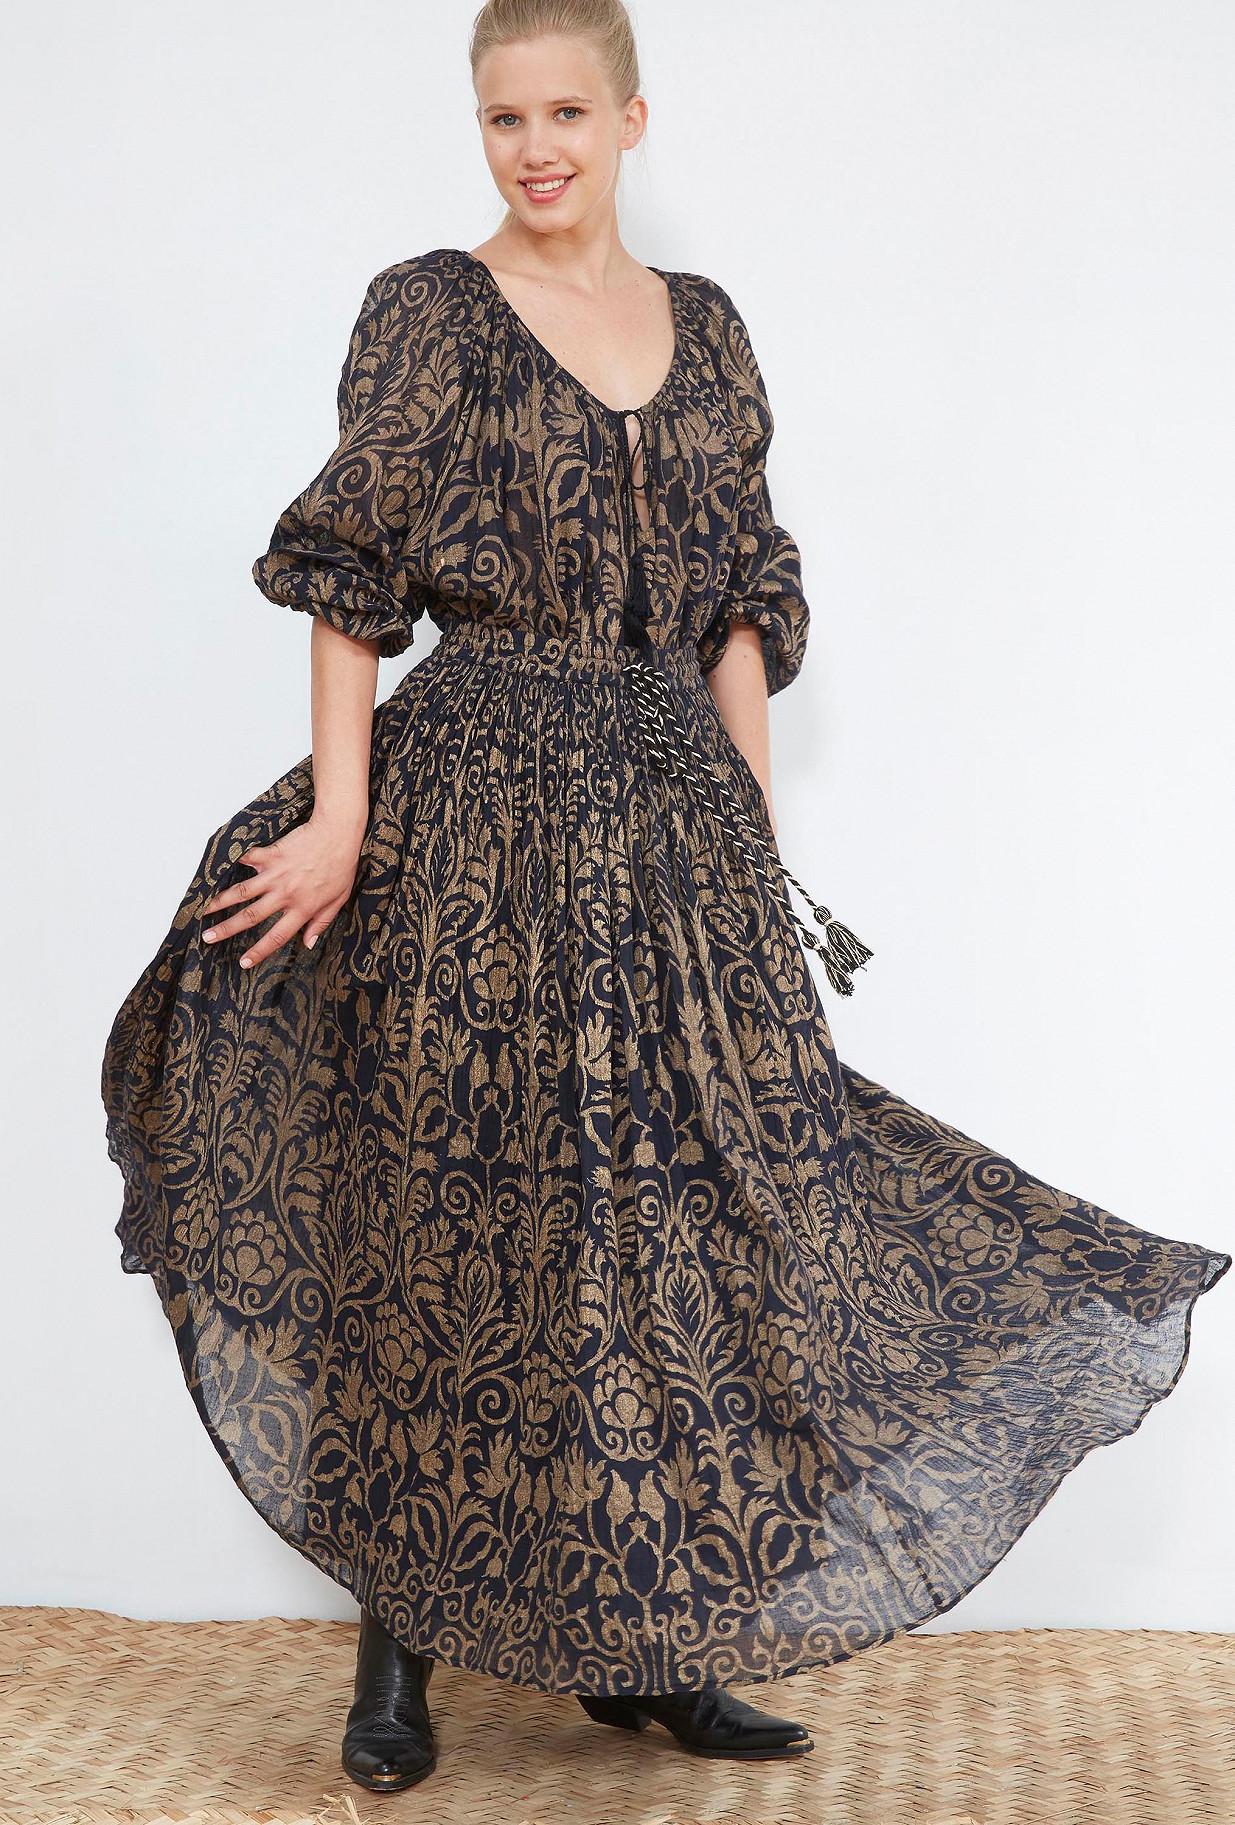 clothes store SKIRT  Regine french designer fashion Paris